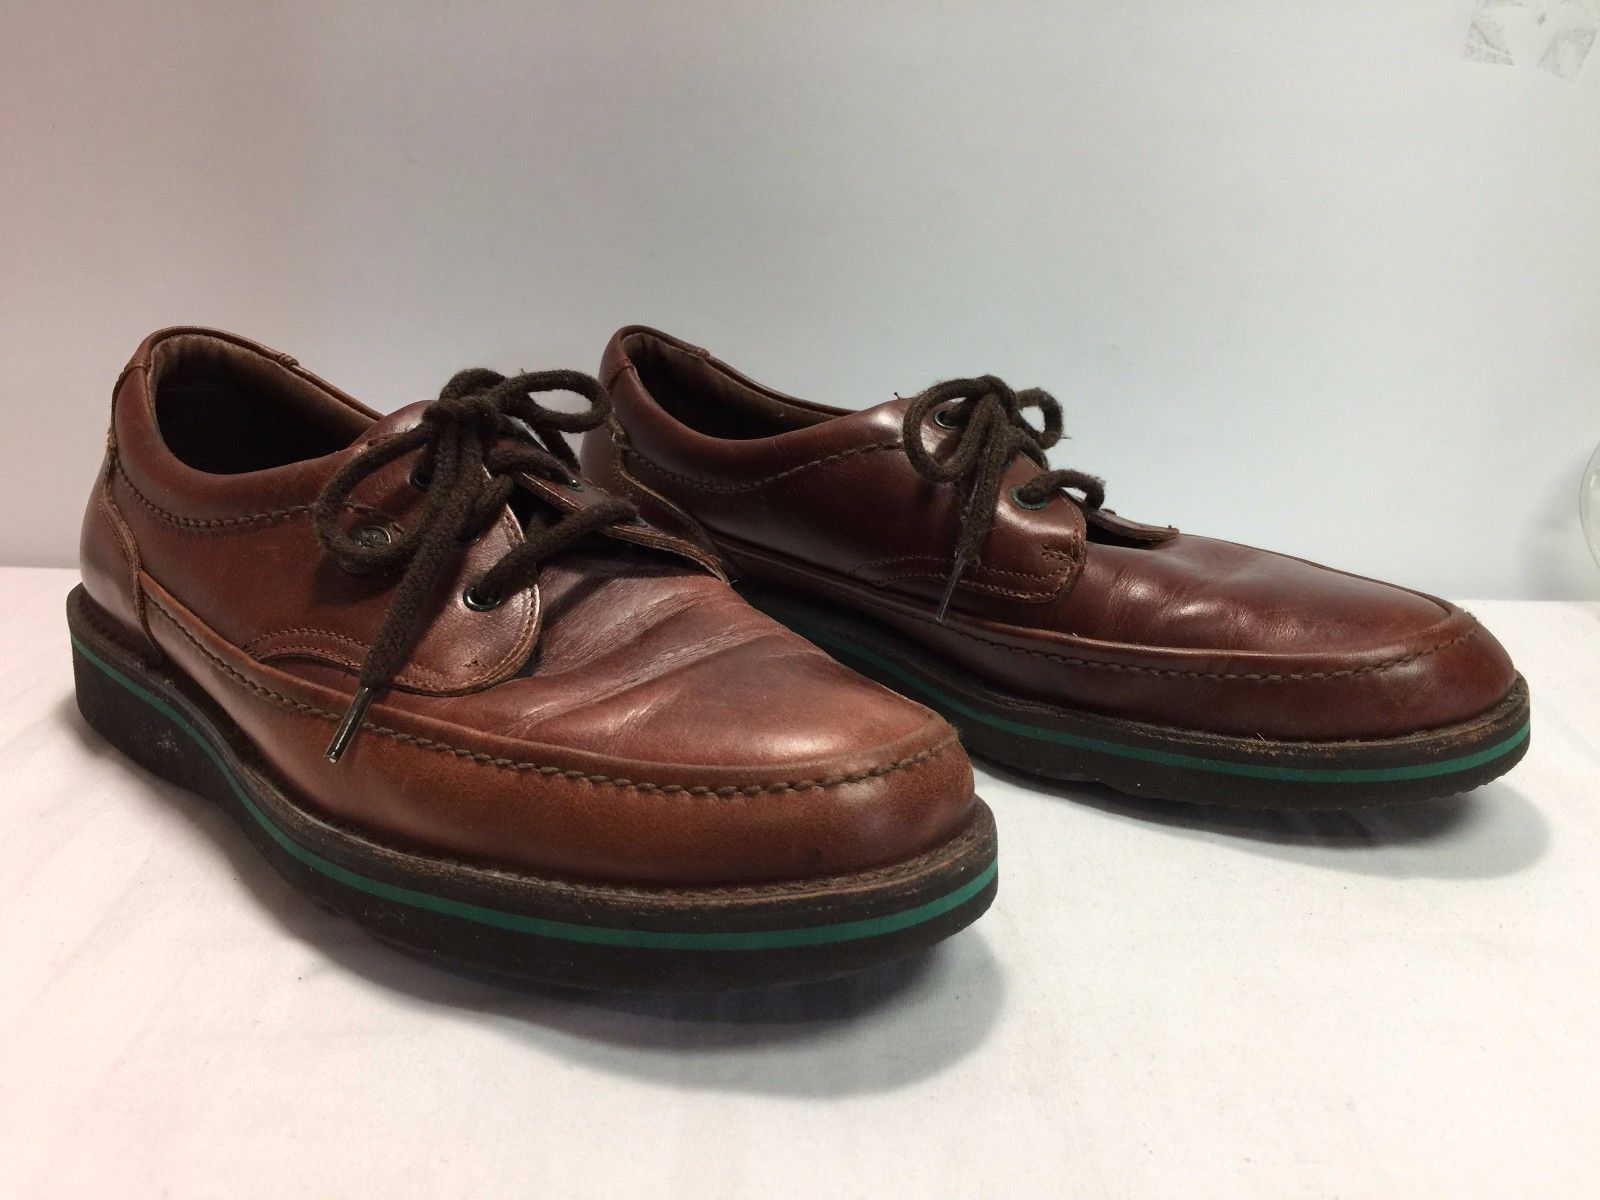 c26e8c392b497c HUSH PUPPIES The Body Shoe Men s Brown and 50 similar items